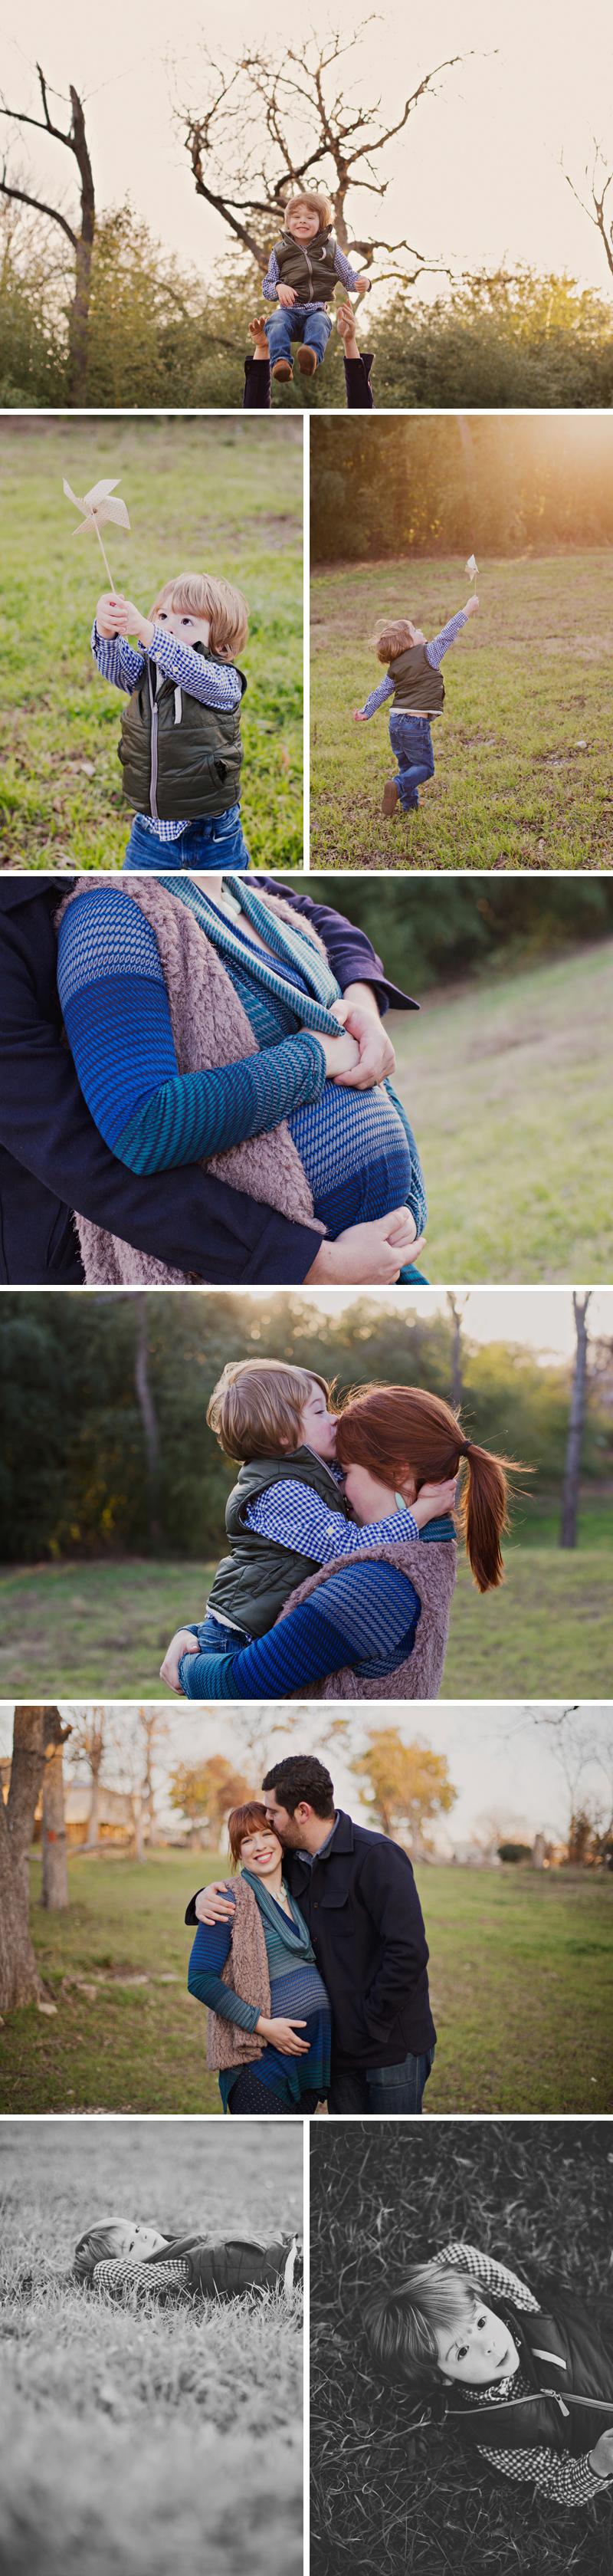 Dallas-Newborn-Photographerc006